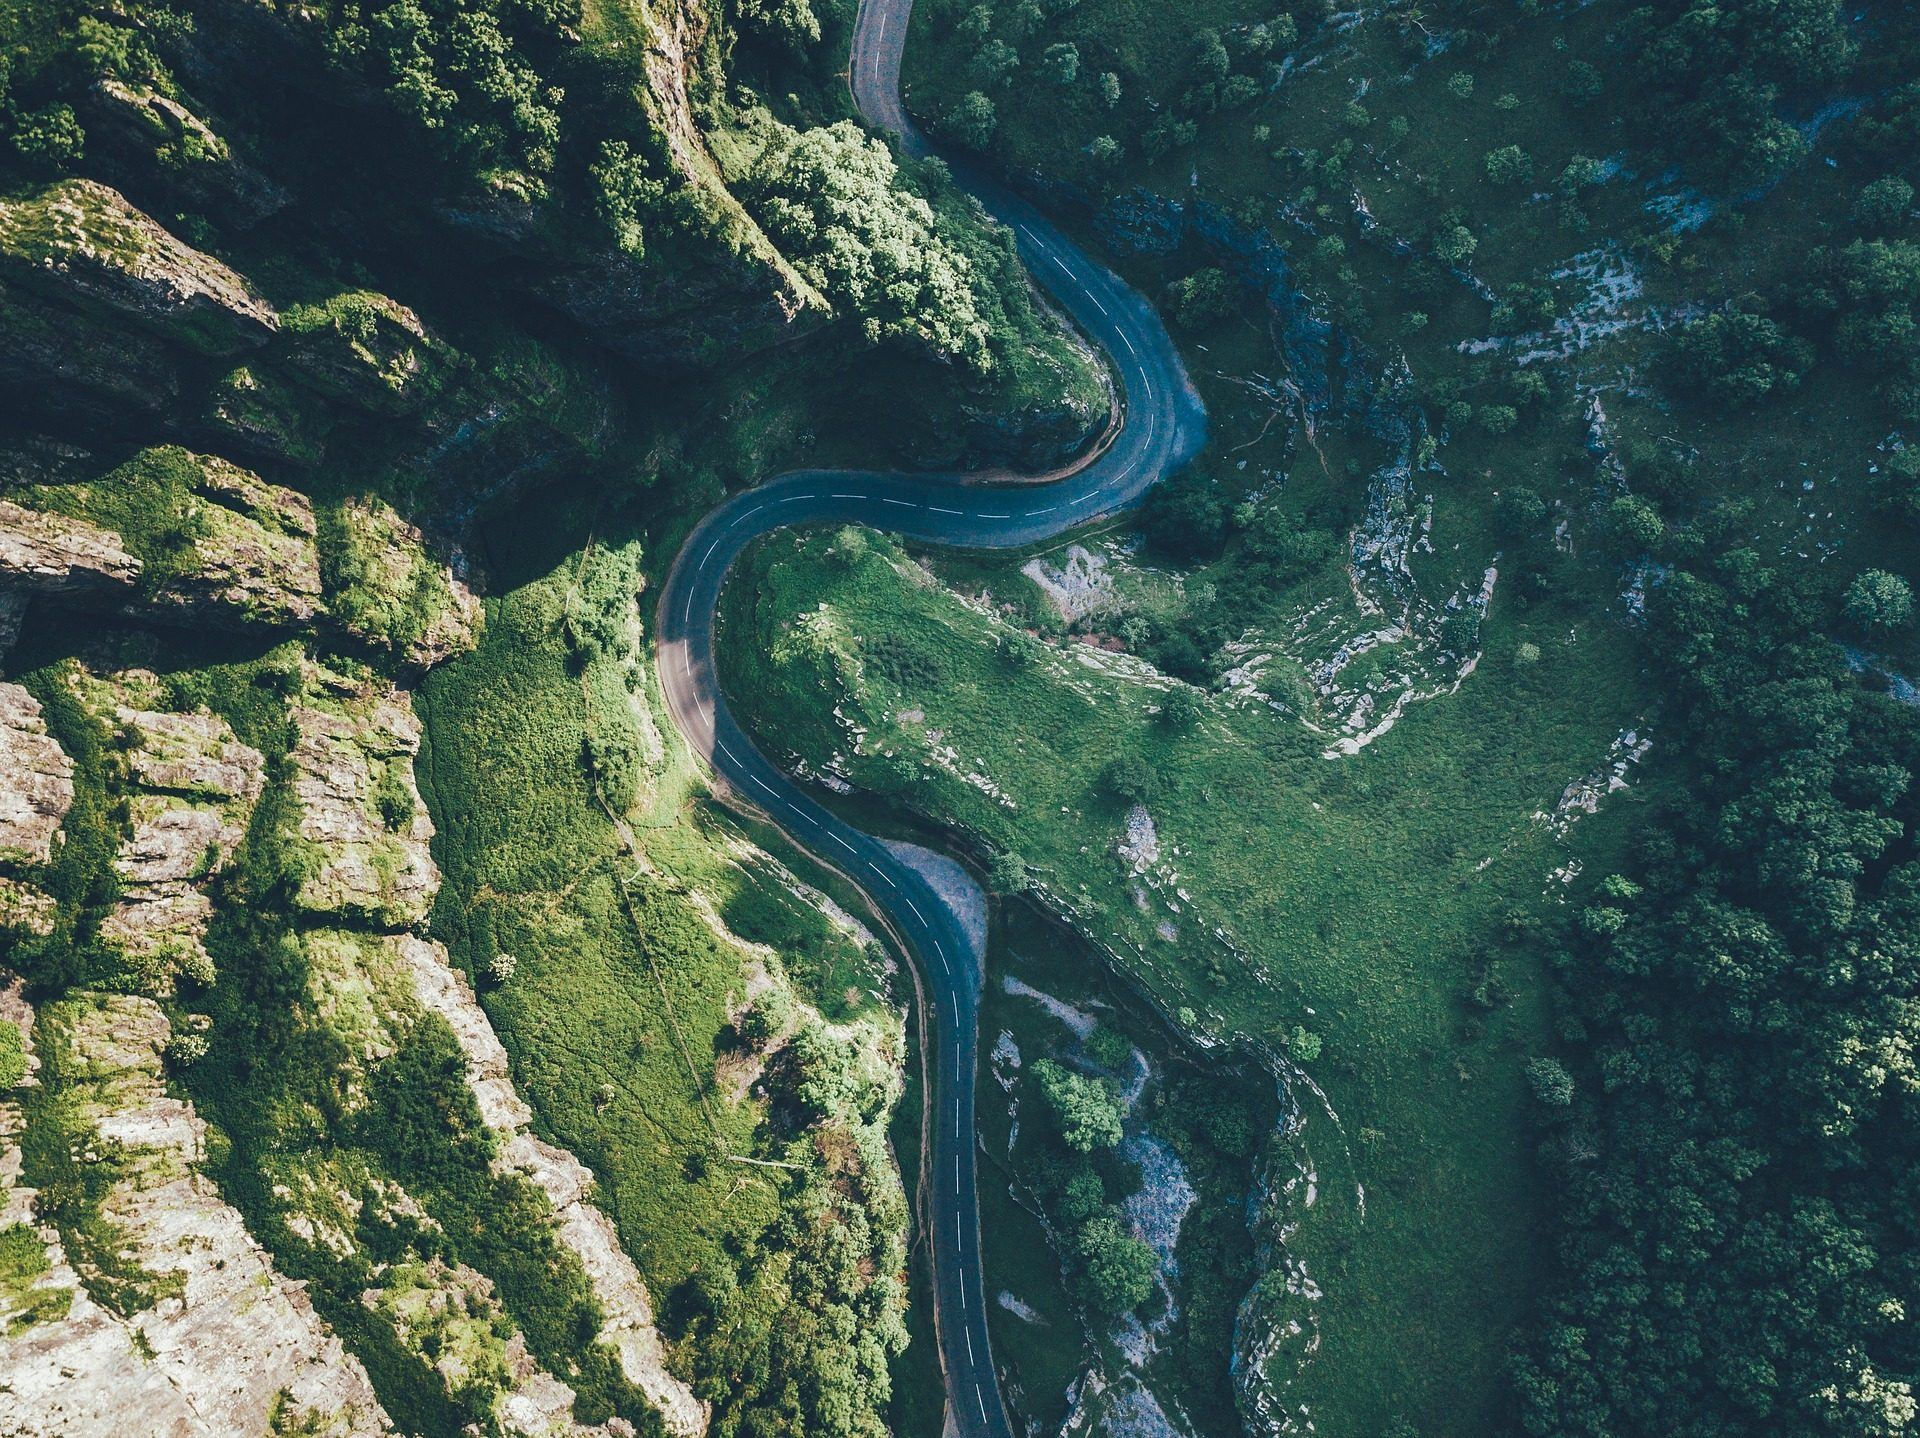 carretera, Estrada, curvas, árvores, vegetación - Papéis de parede HD - Professor-falken.com